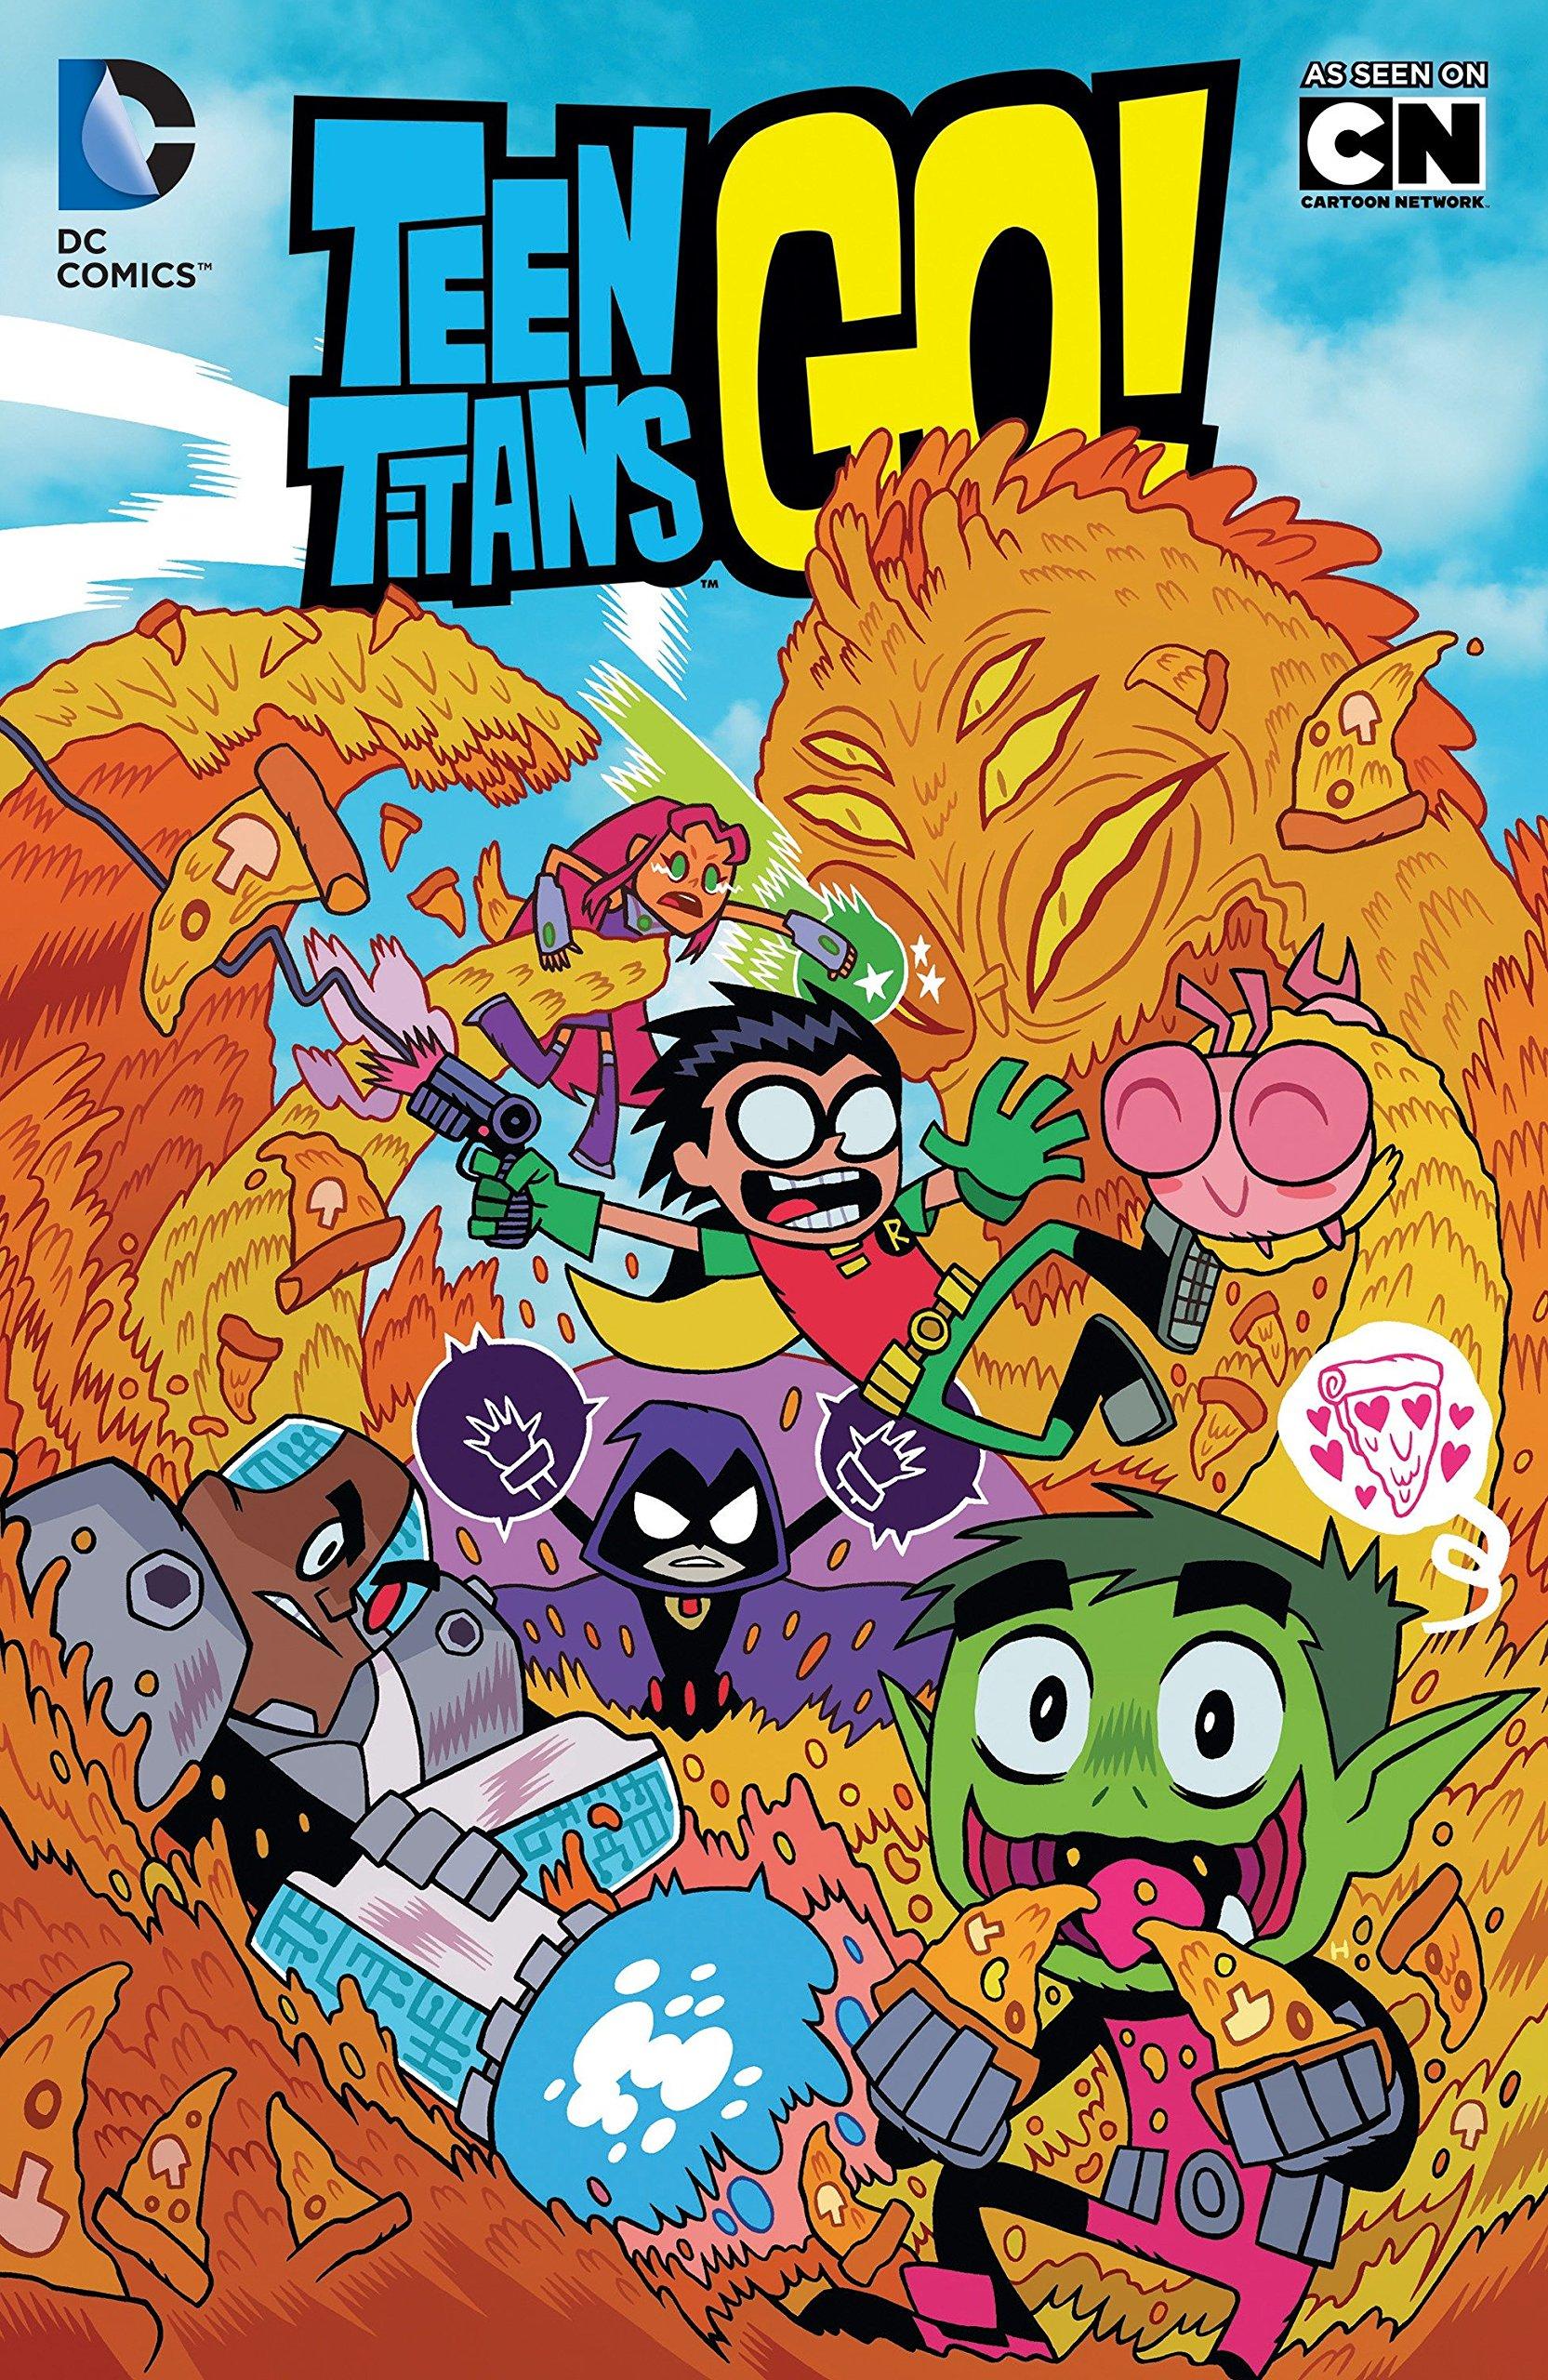 Cartoon network teen titans comic